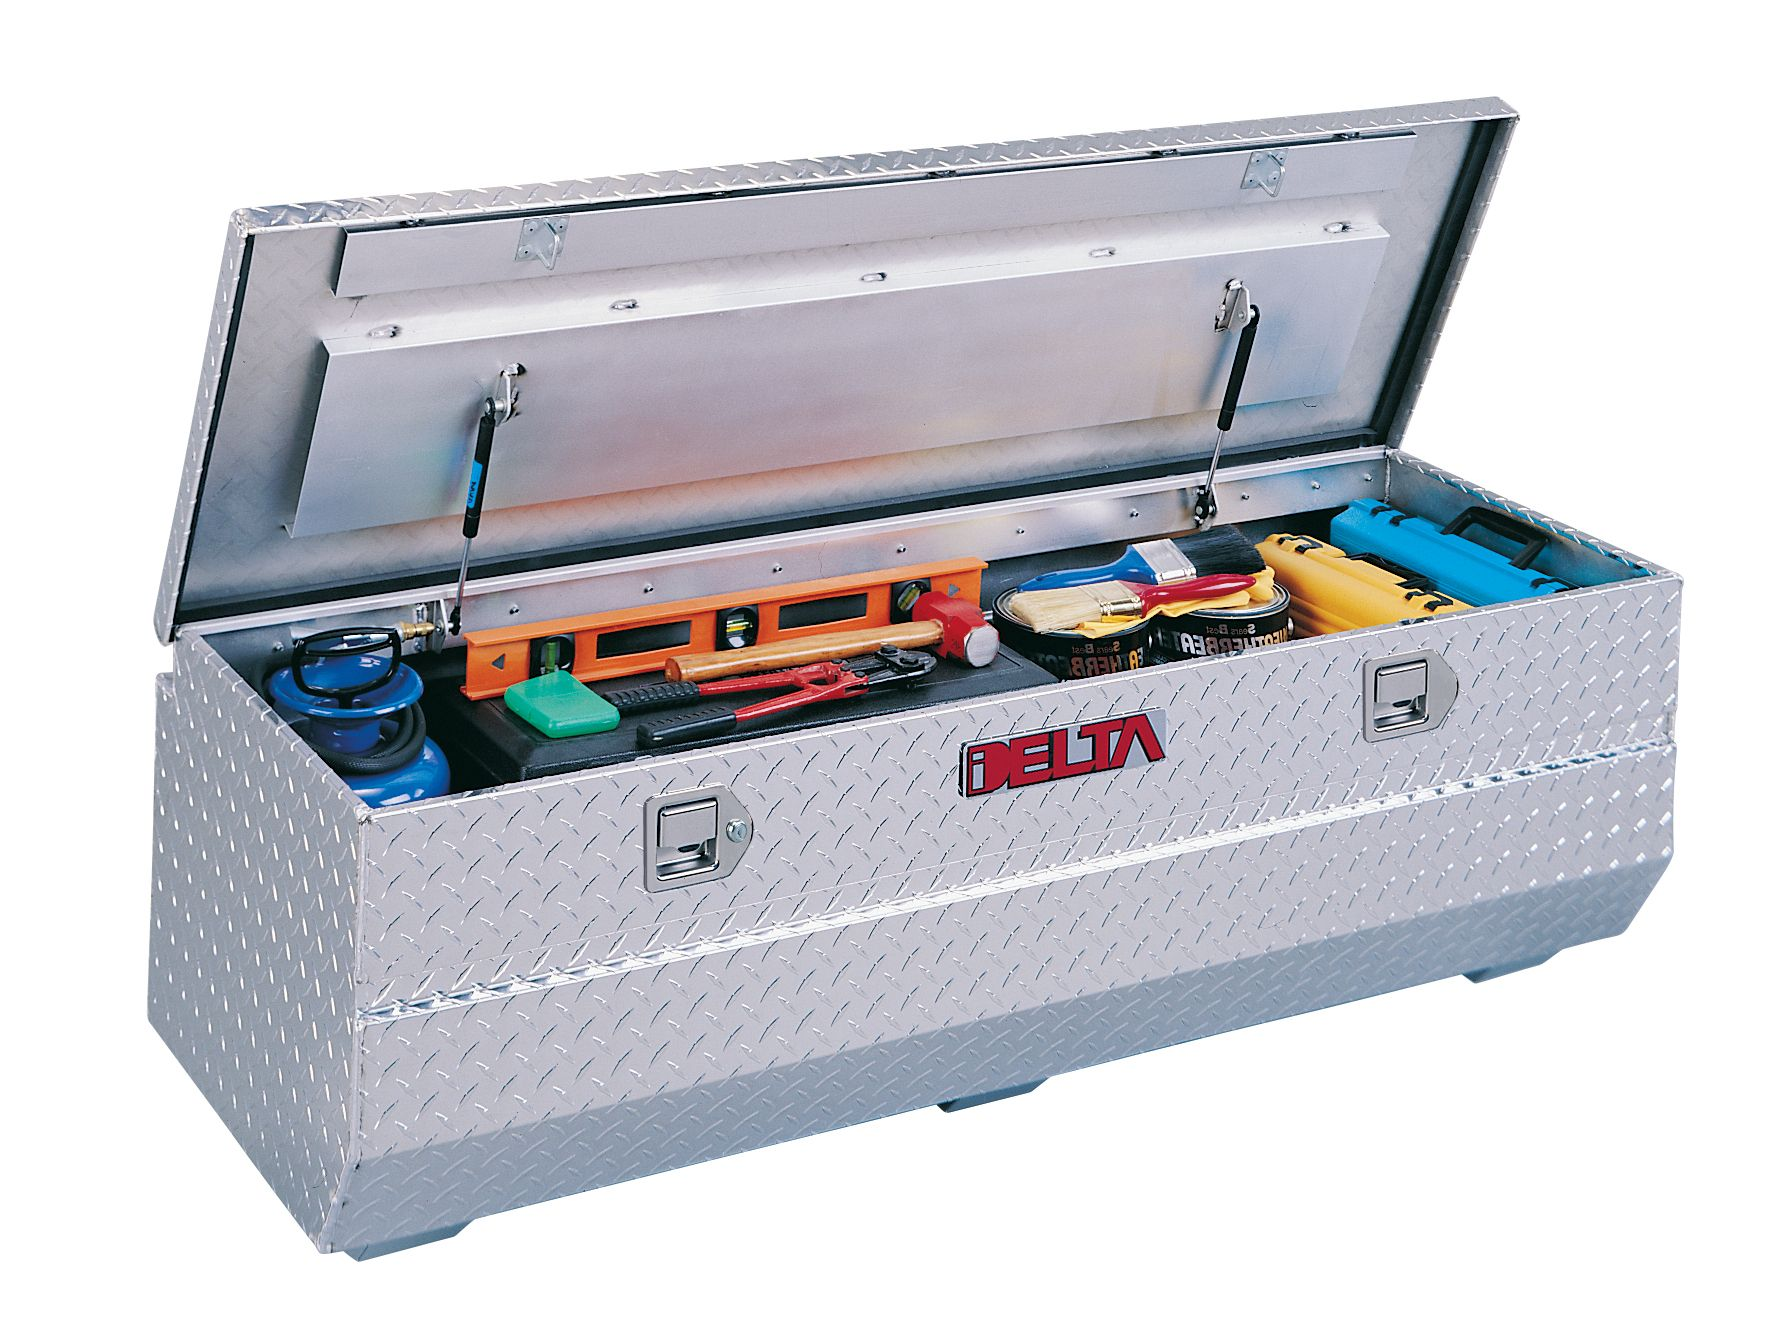 Delta Chest Truck Tool Boxes Truck Tool Box Delta Power Tools Tool Box